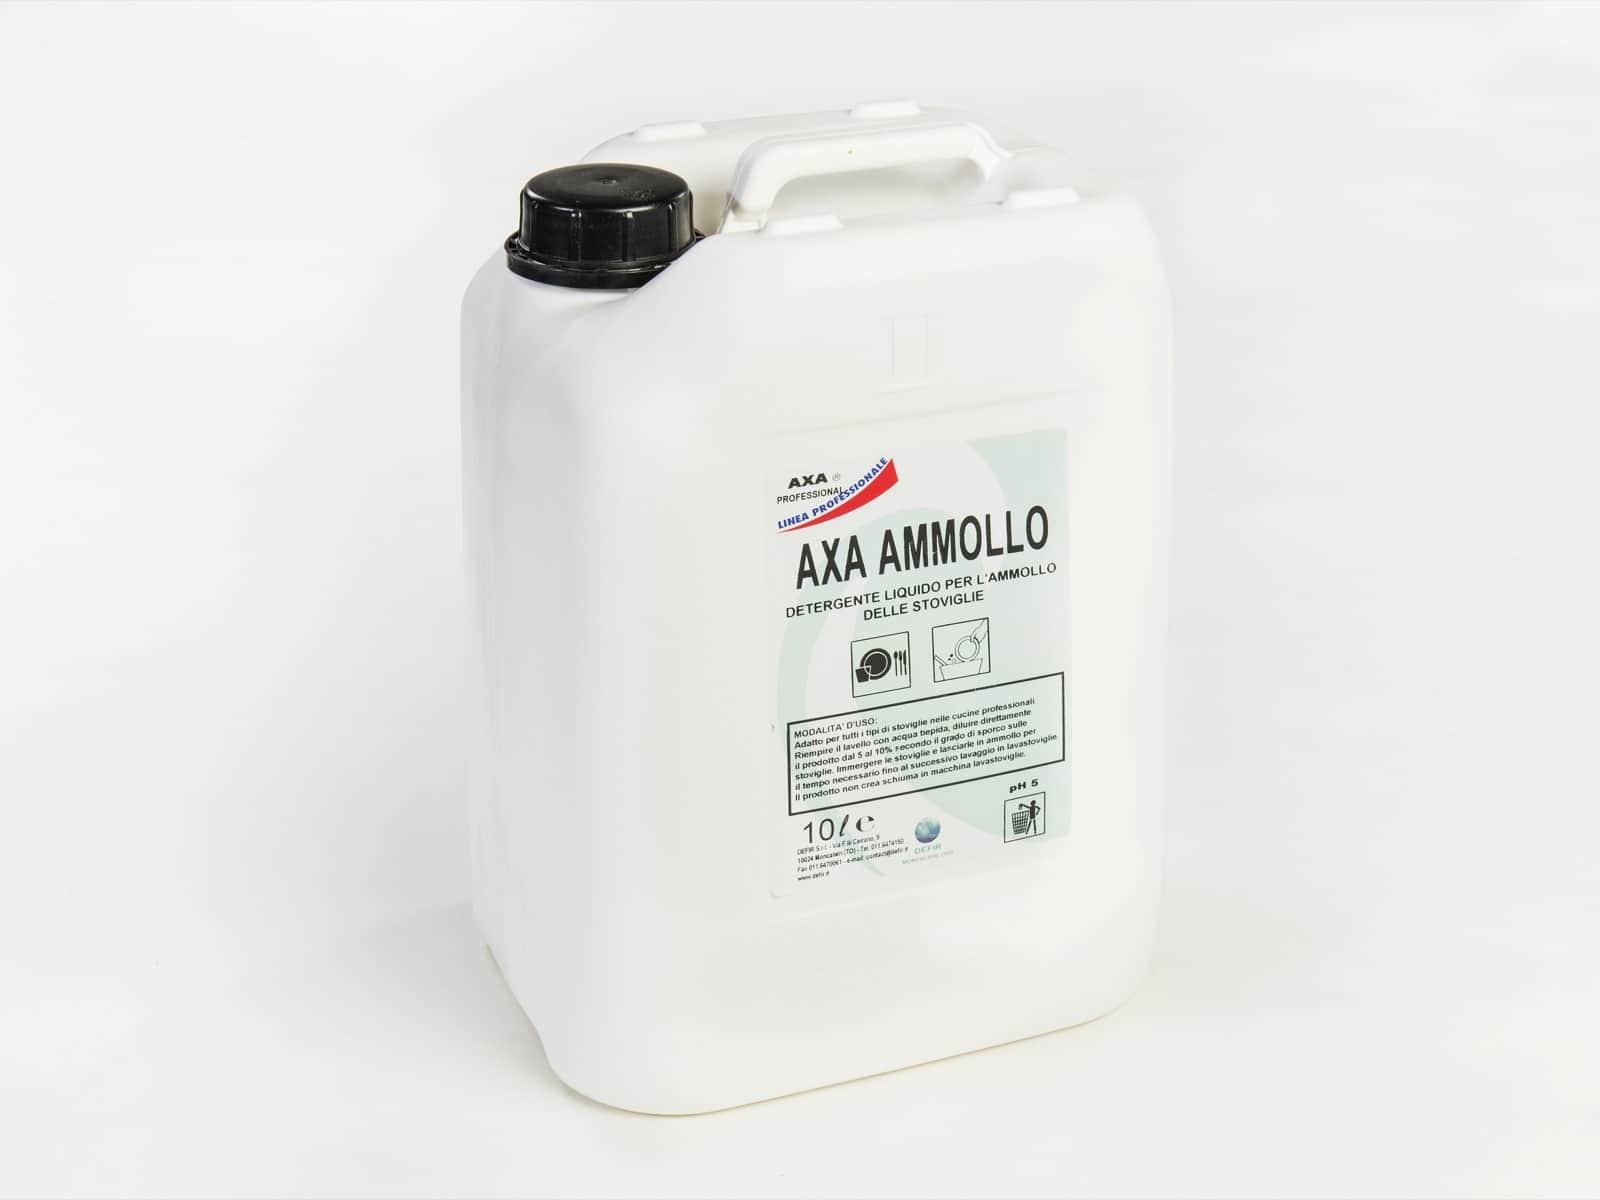 Axa Ammollo detersivo lavastoviglie 10L - Defir detergenti Moncalieri Torino